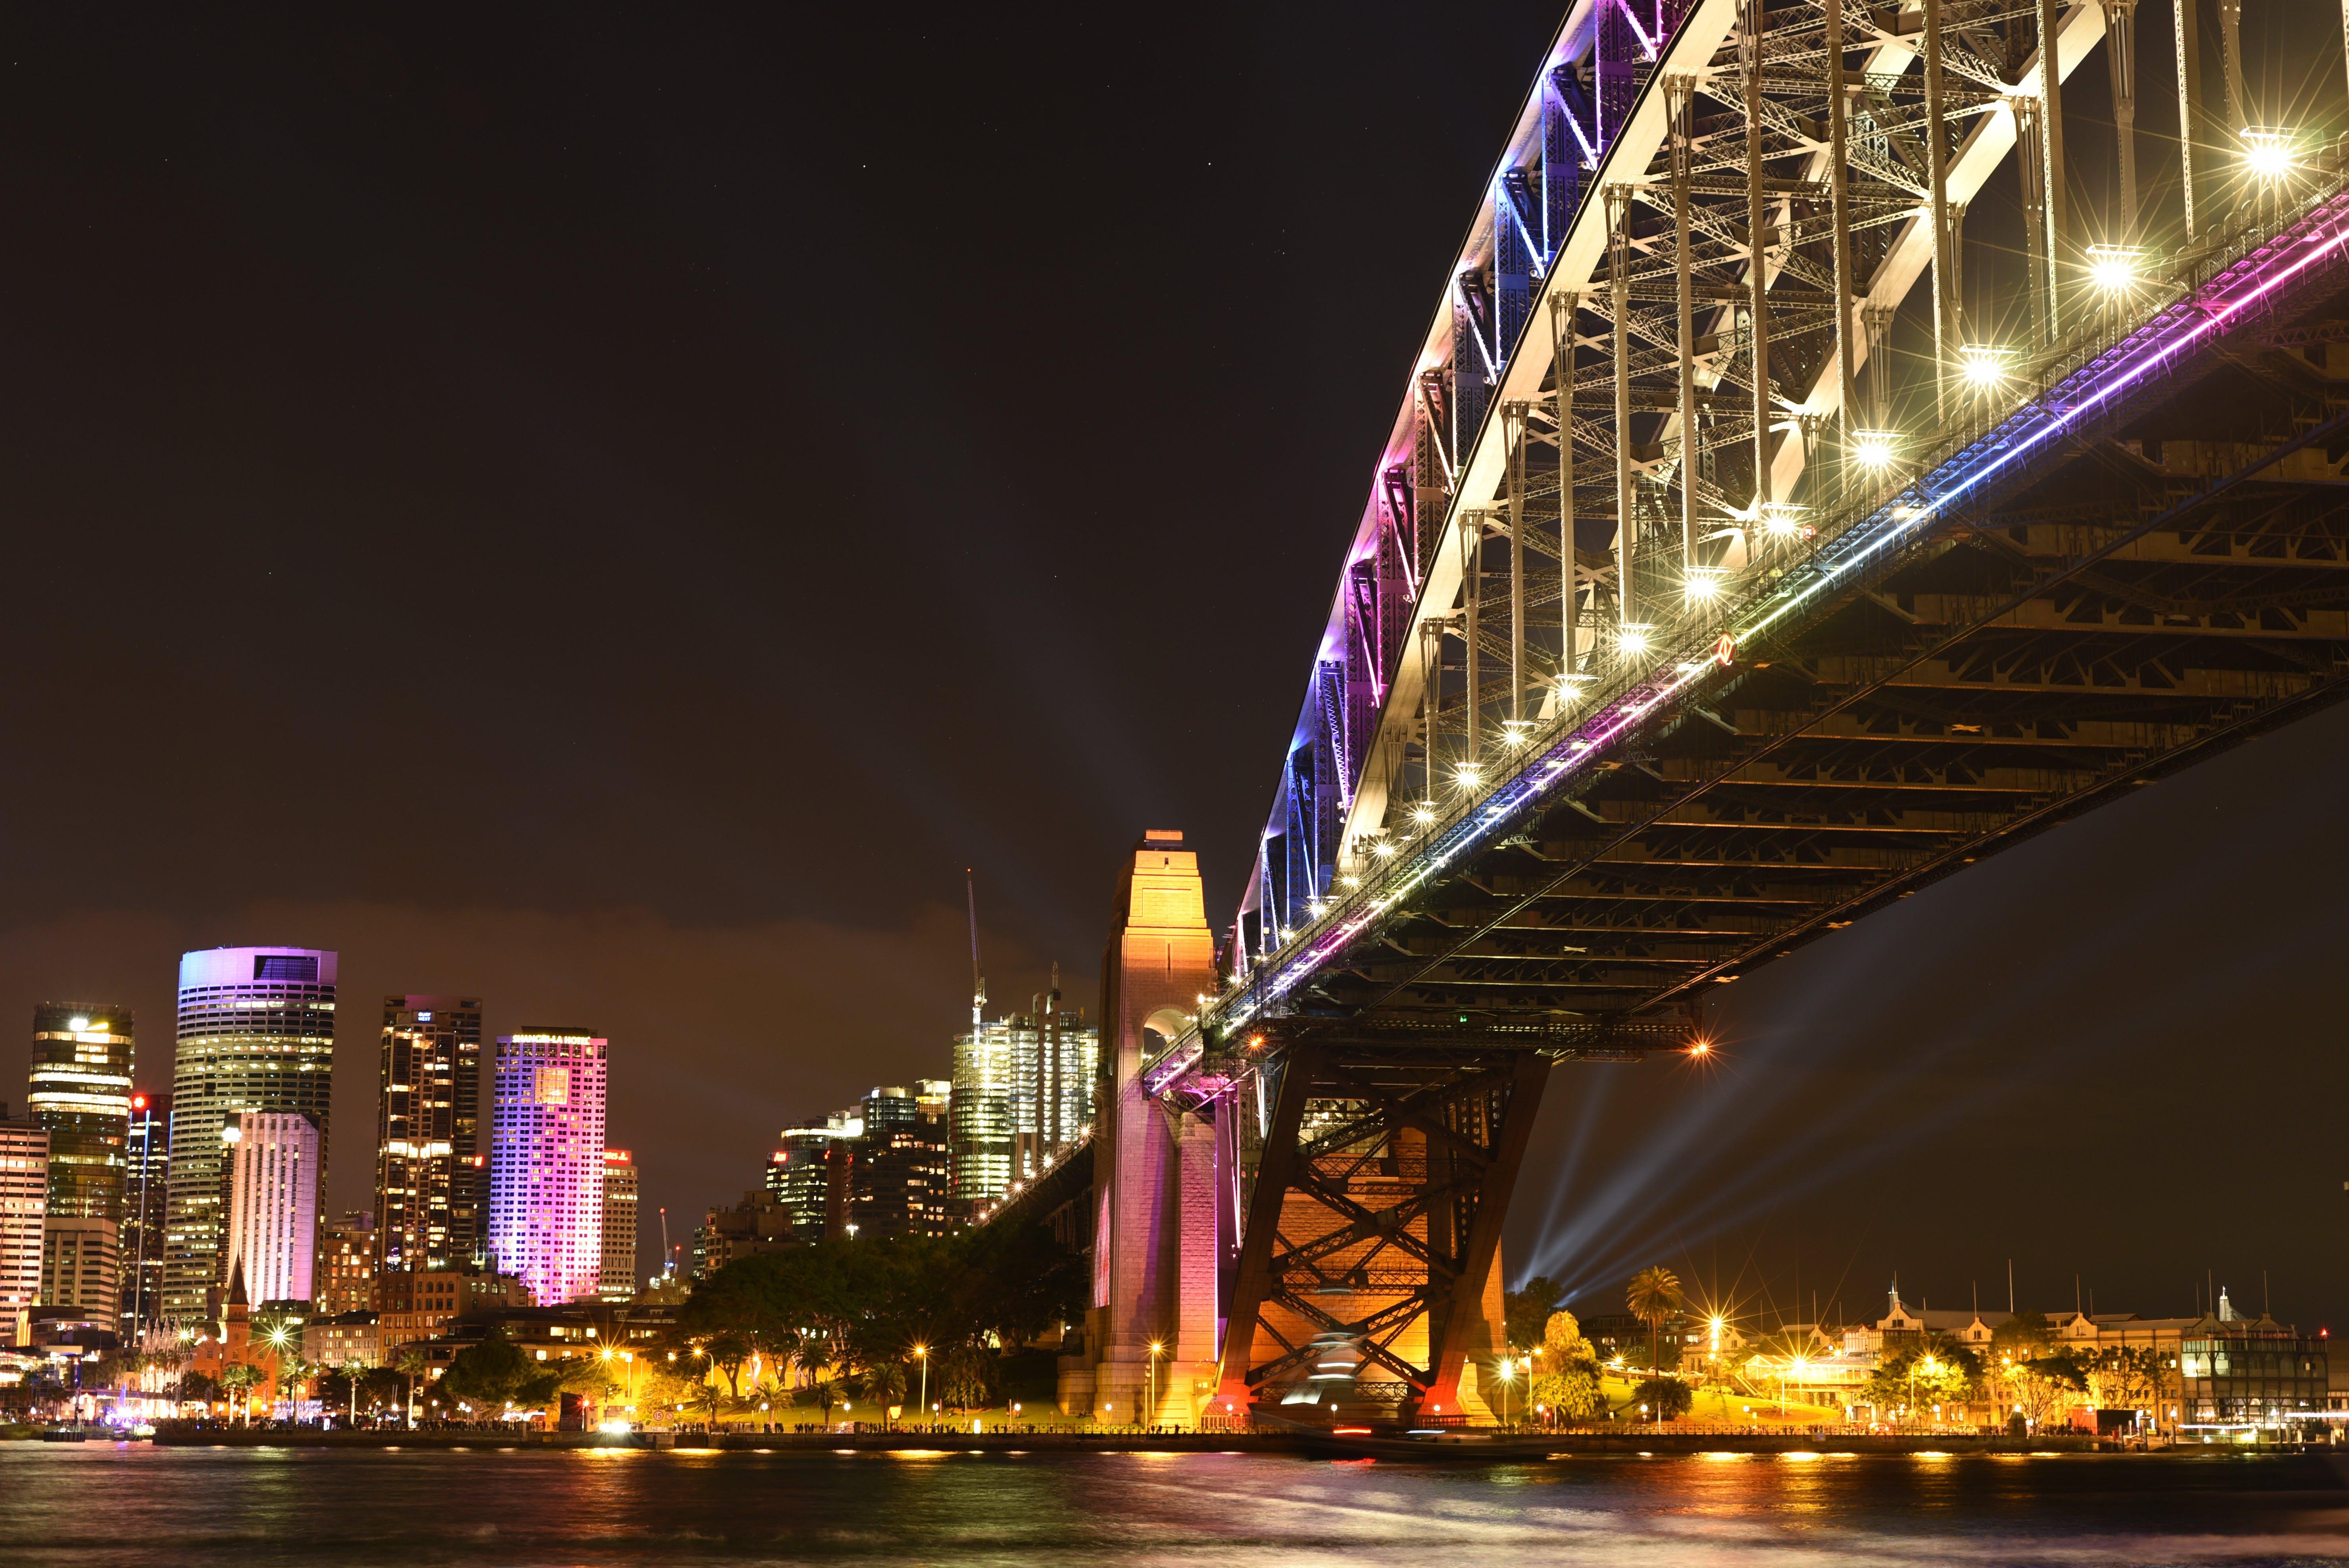 Fotos de stock gratuitas de agua, arquitectura, Australia, céntrico